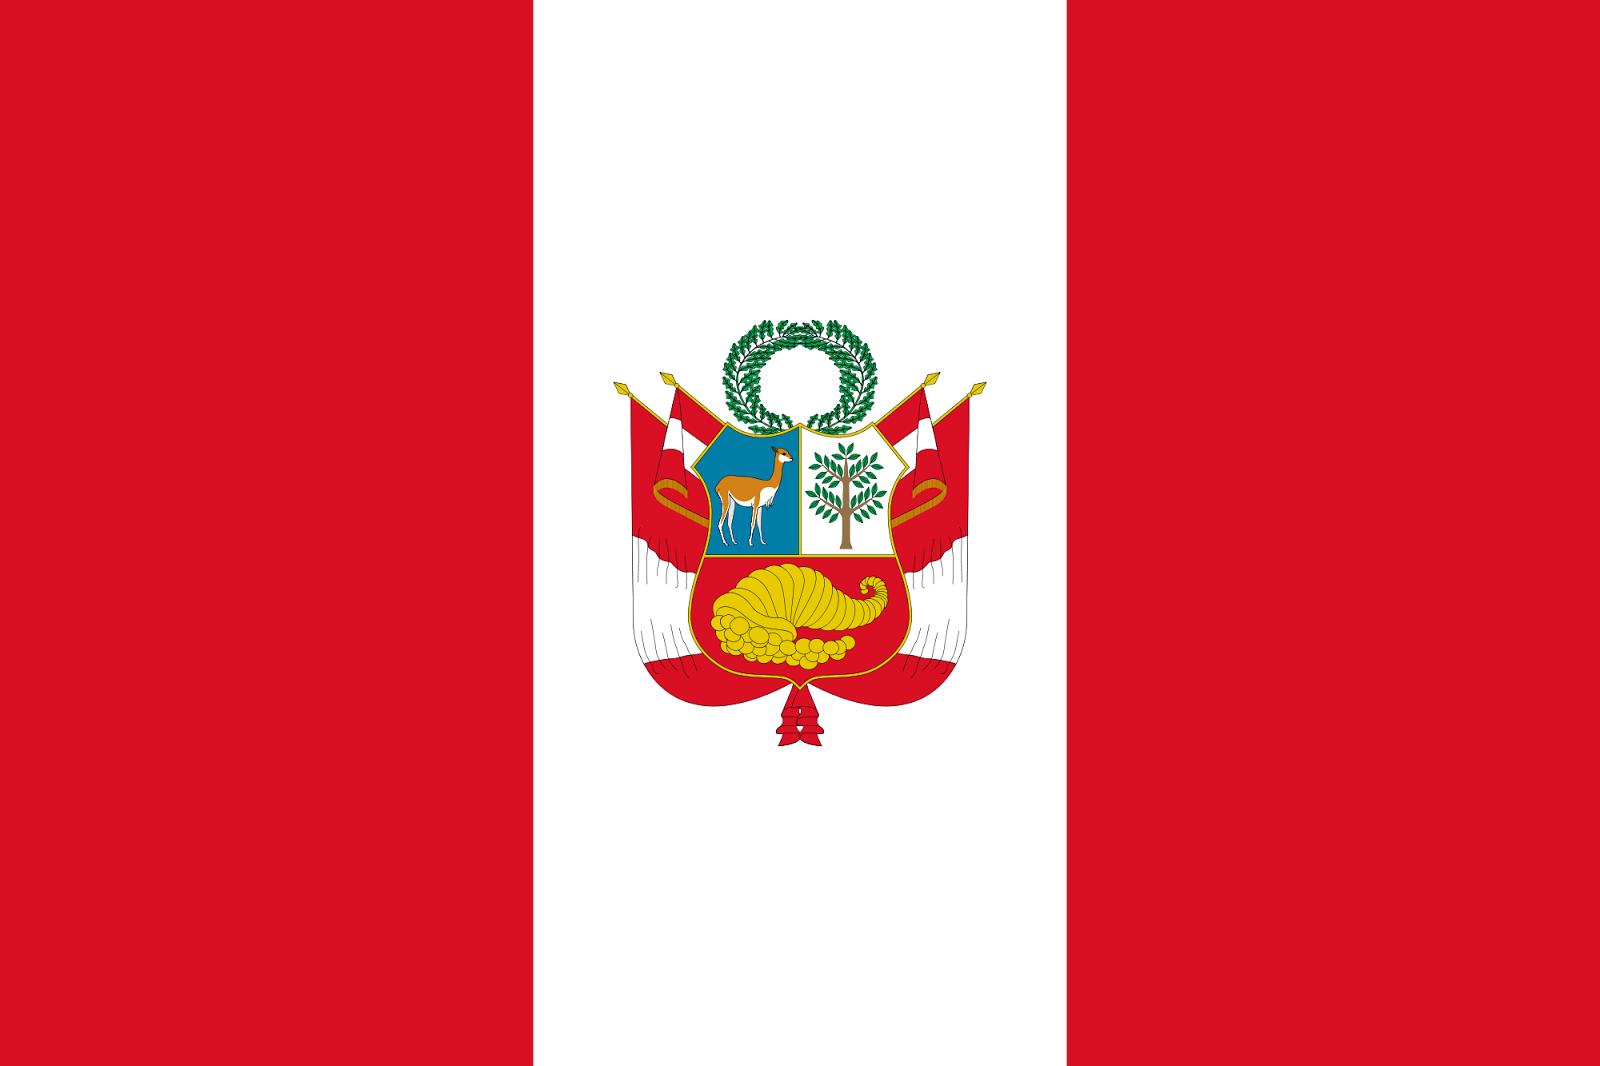 http://carbrandsincurrentproduction.blogspot.com.es/search/label/Peru